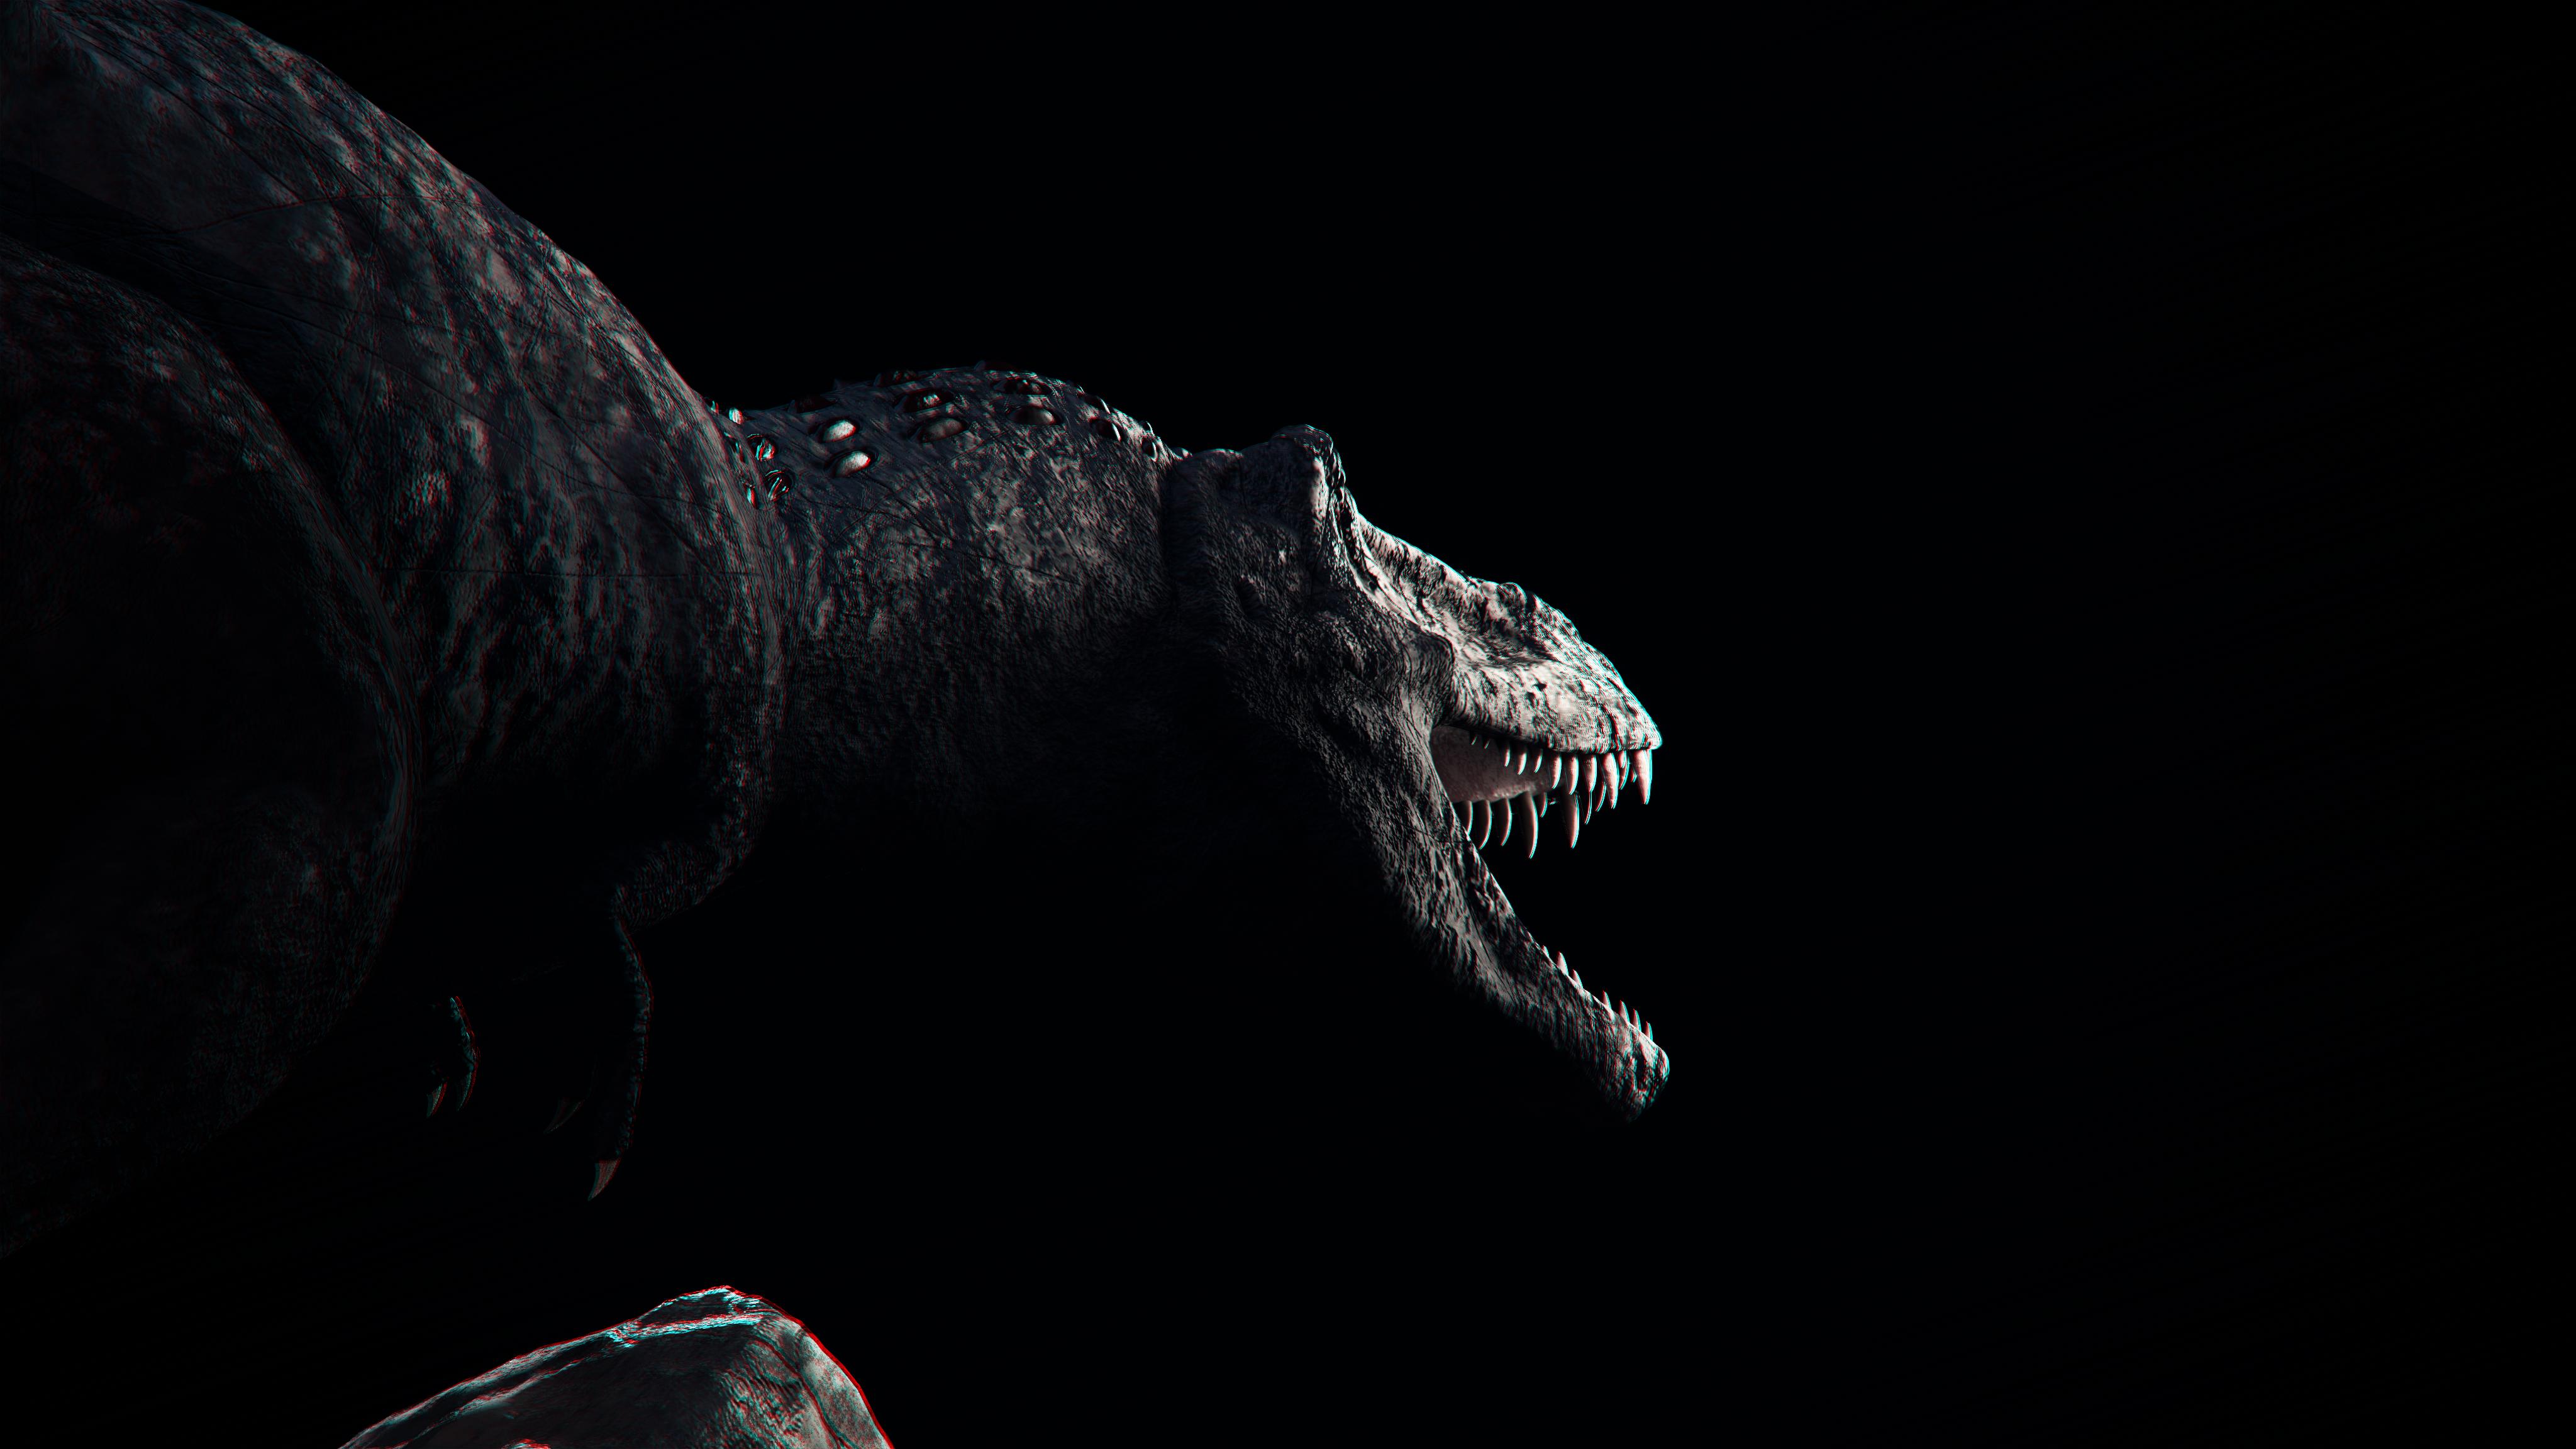 Tarbosaurus_image1_6_00000.png